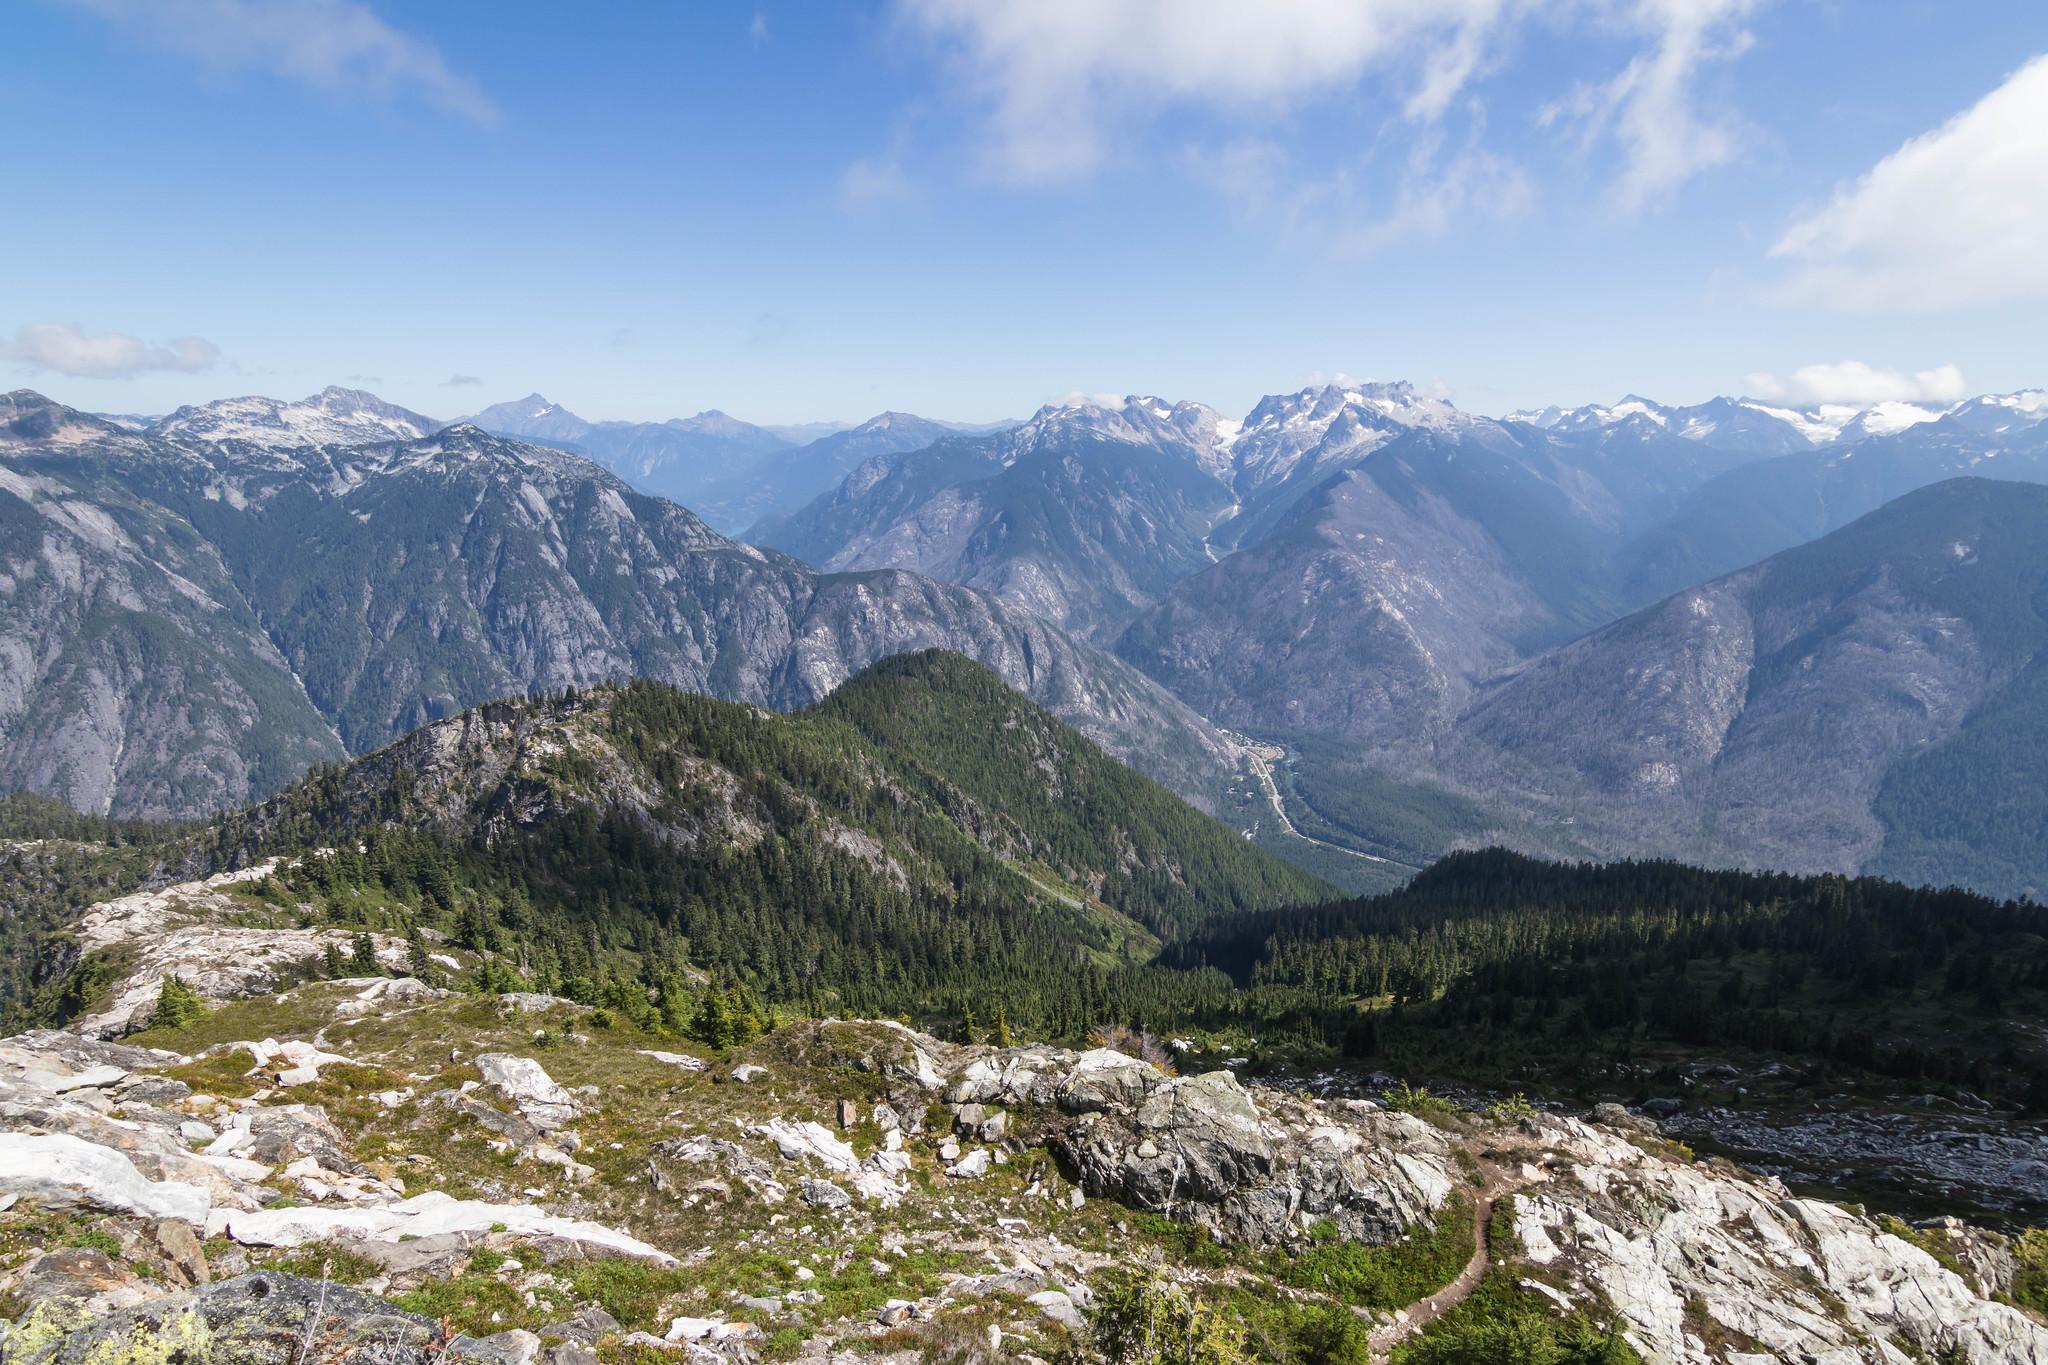 Leaving Trappers Peak